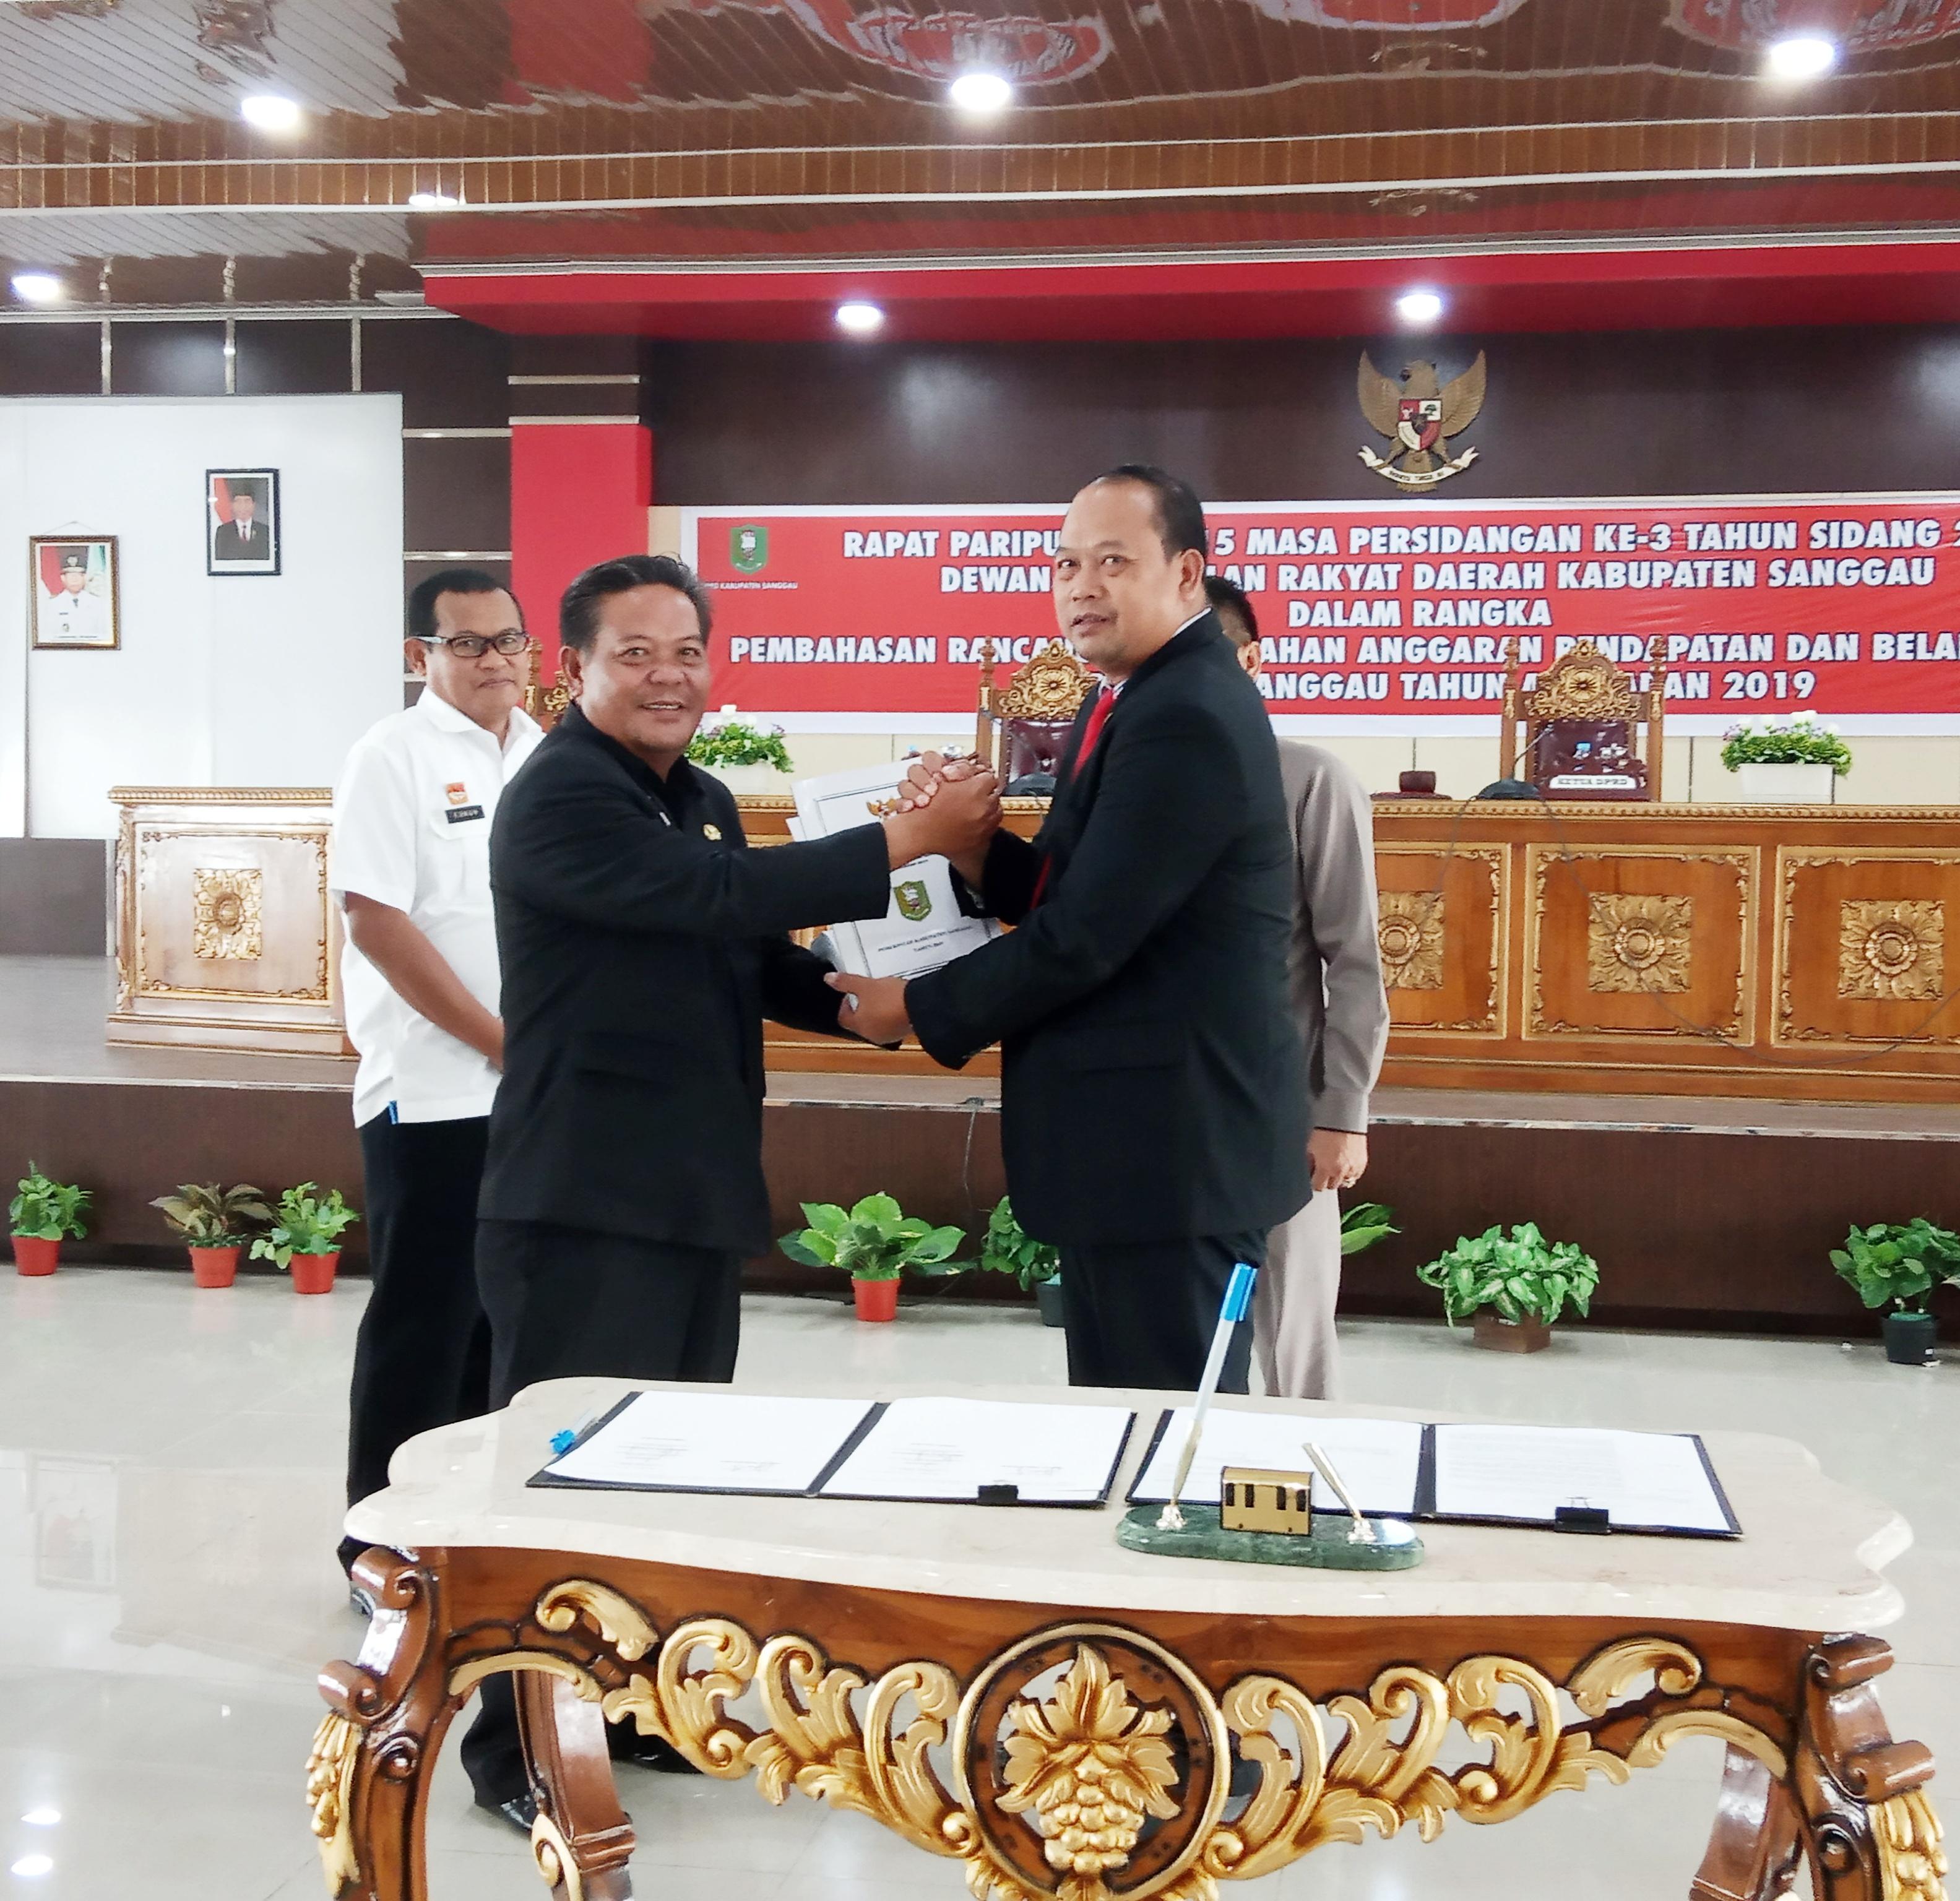 DPRD Sanggau Setujui Perubahan APBD Tahun 2019